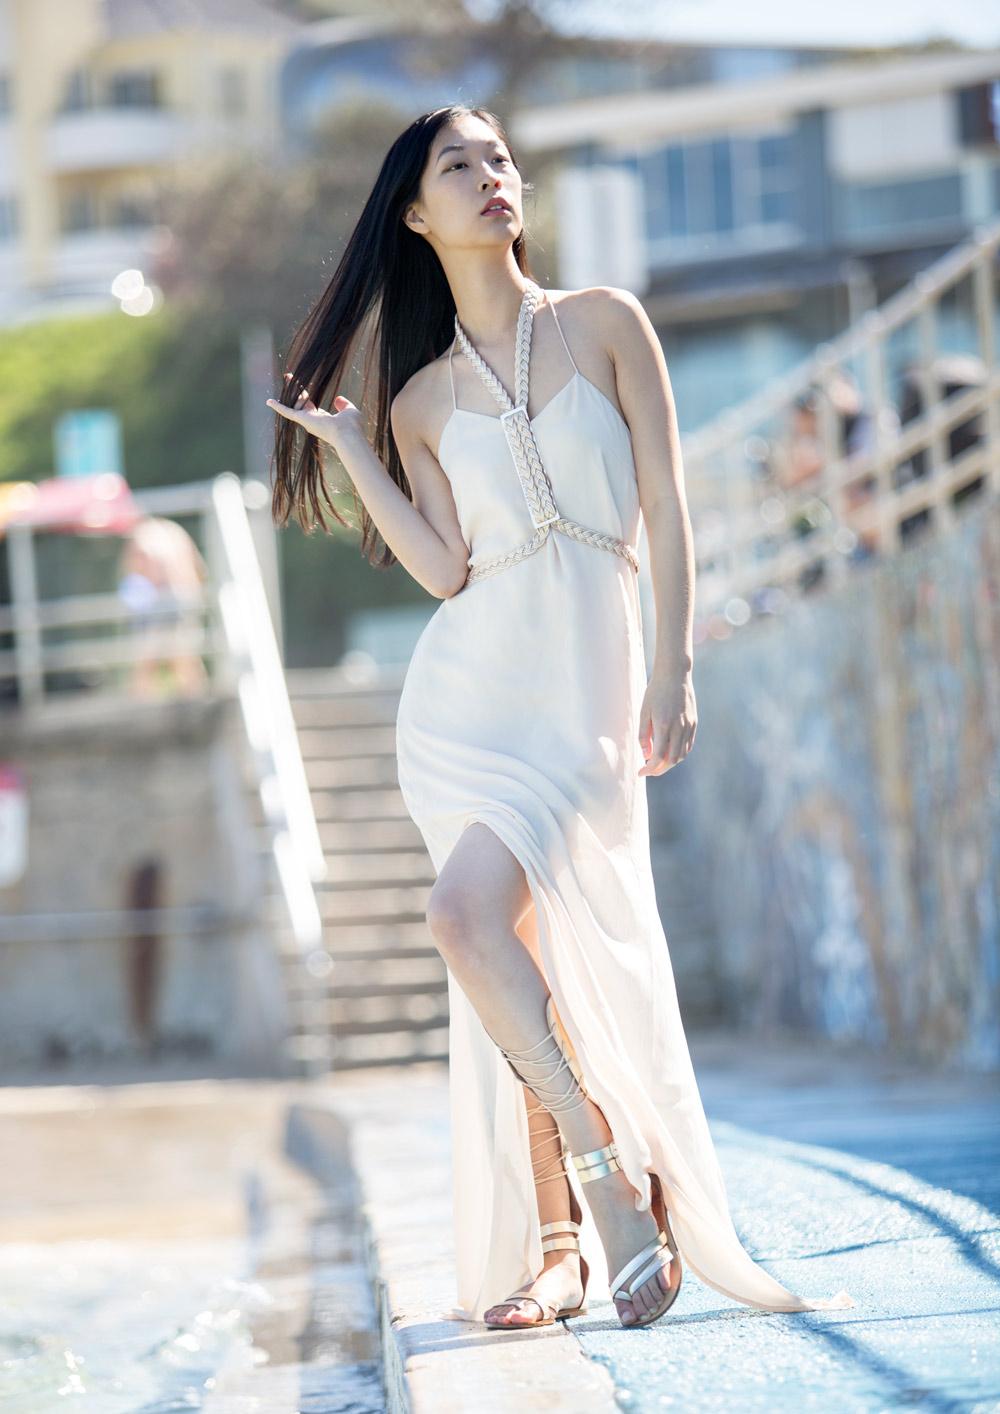 ixiah, warrior photoshoot, cissy zhang, girl in the bunny ears